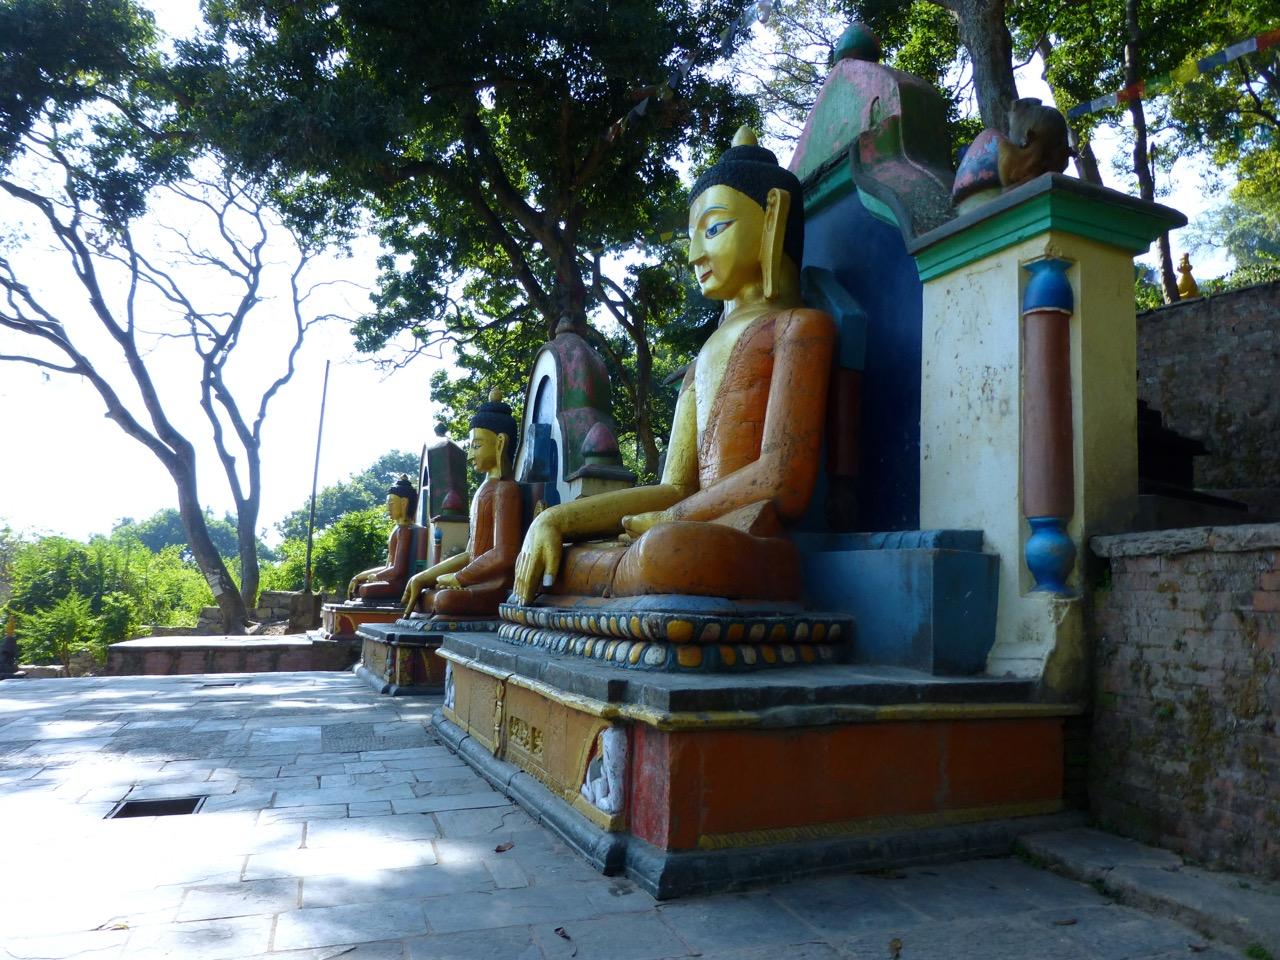 Three giant Buddhas